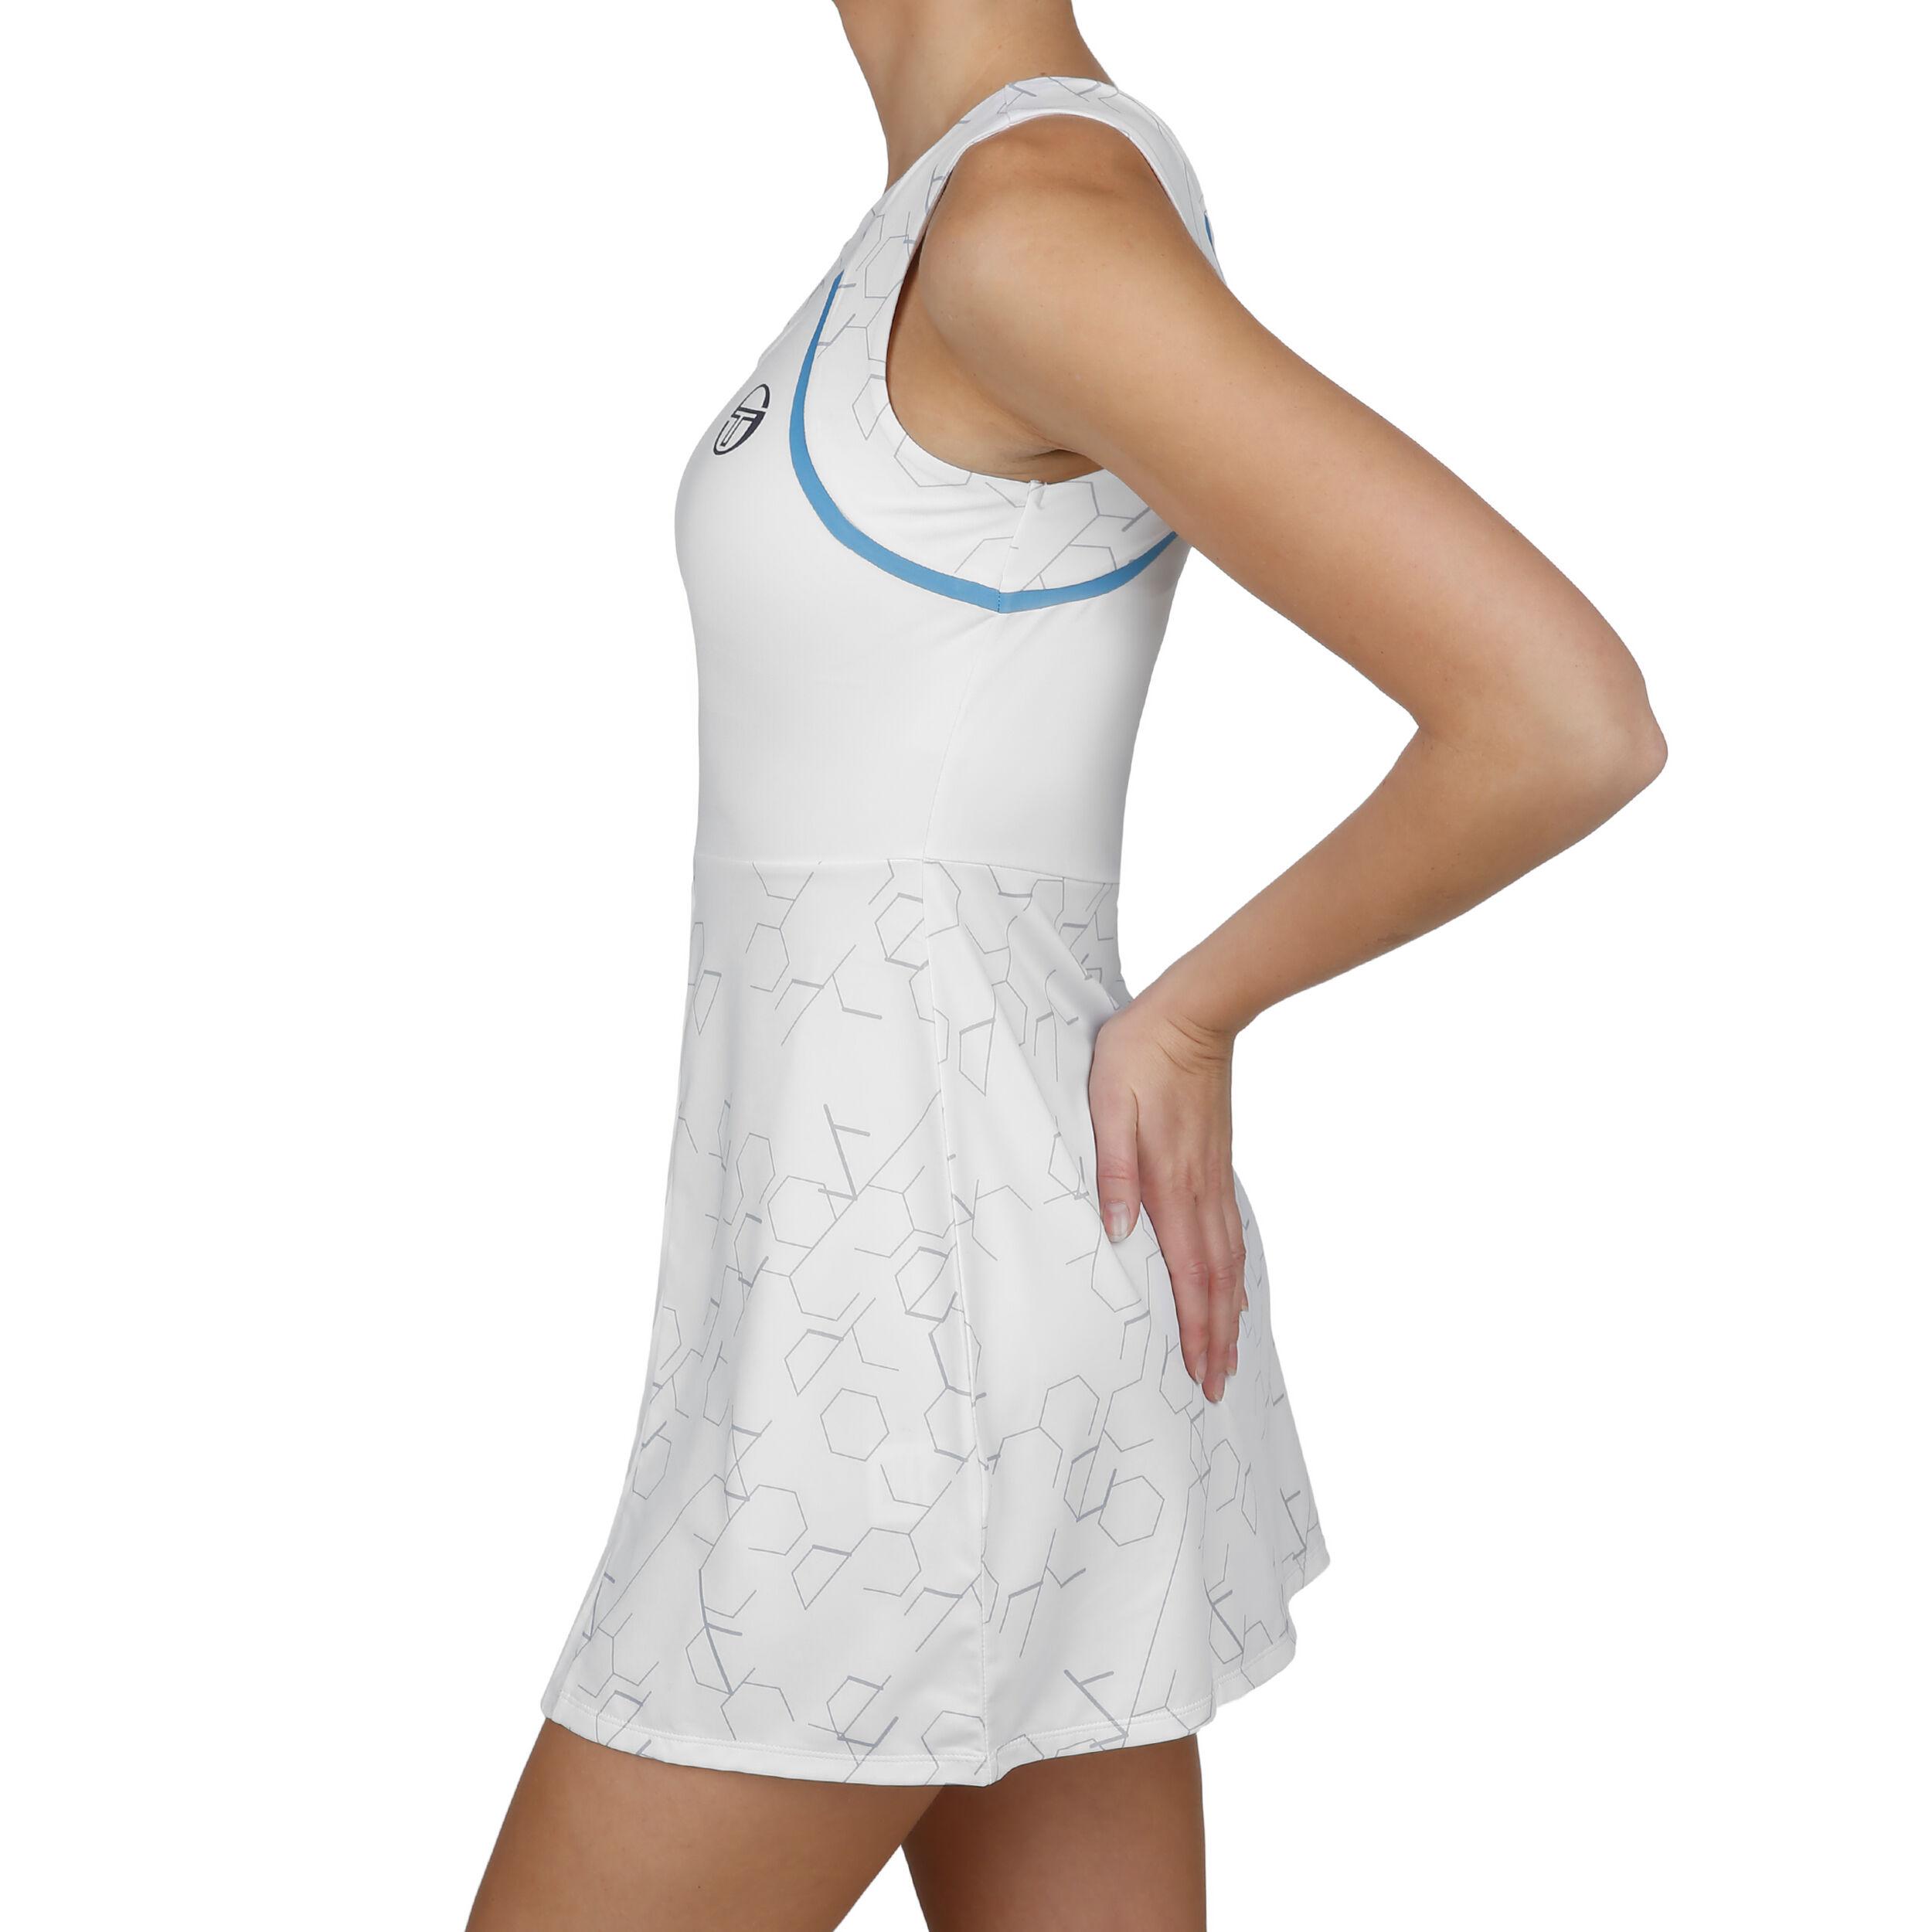 Online Sergio Tacchini Perspective WeißLimette Damen Kleid knO0Pw